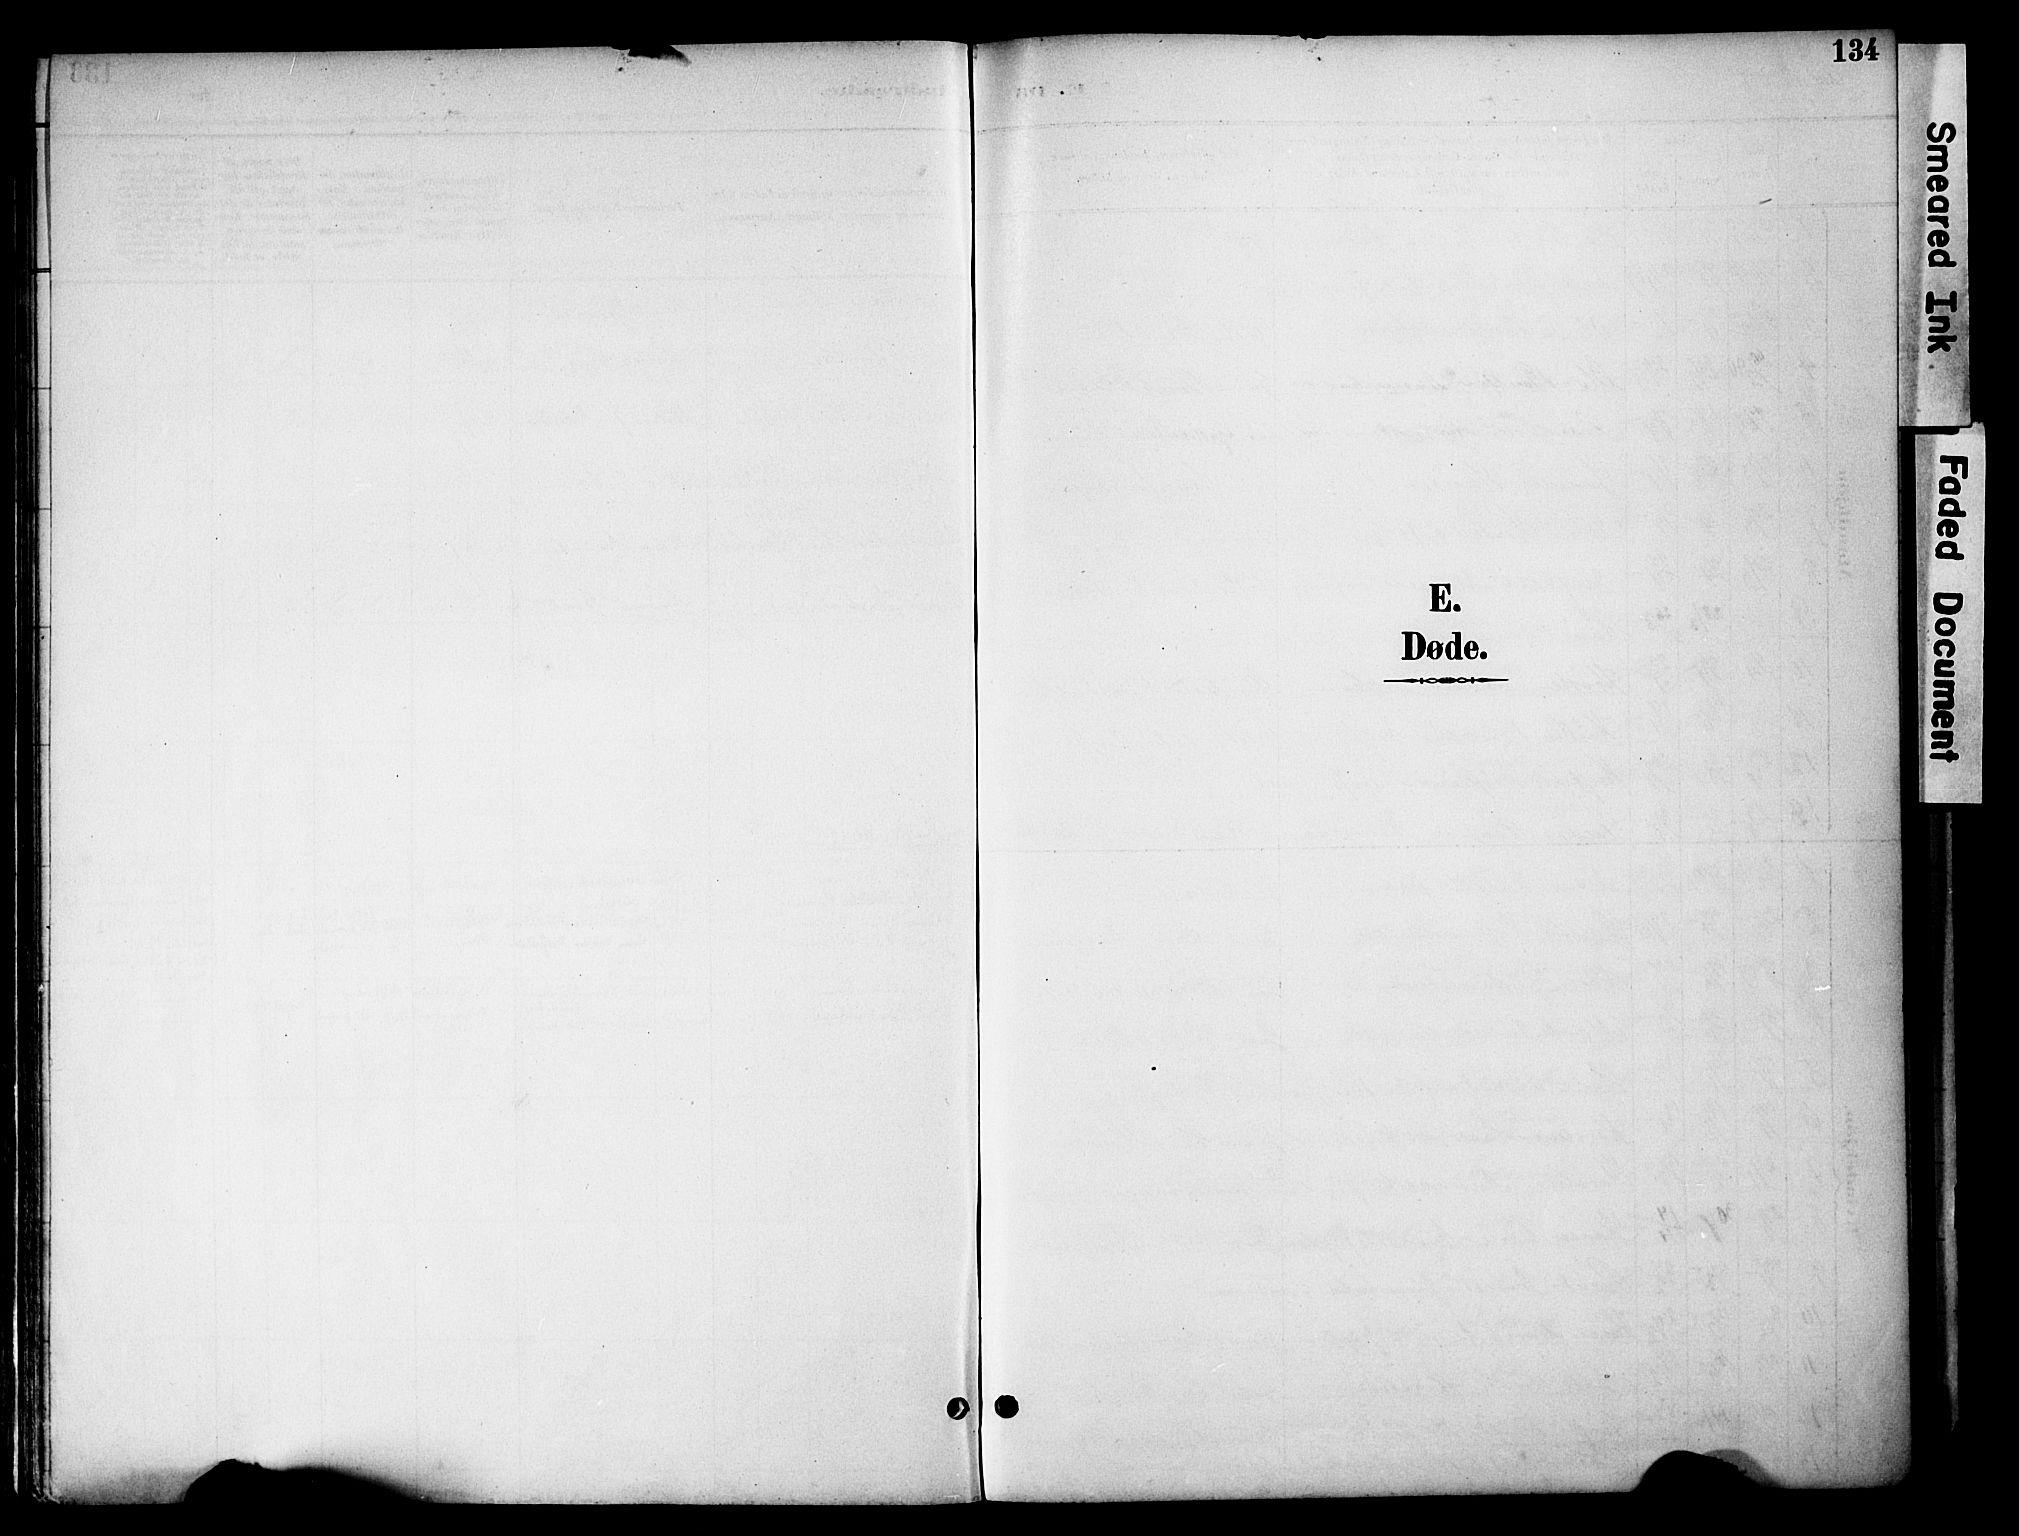 SAH, Gran prestekontor, Ministerialbok nr. 20, 1889-1899, s. 134